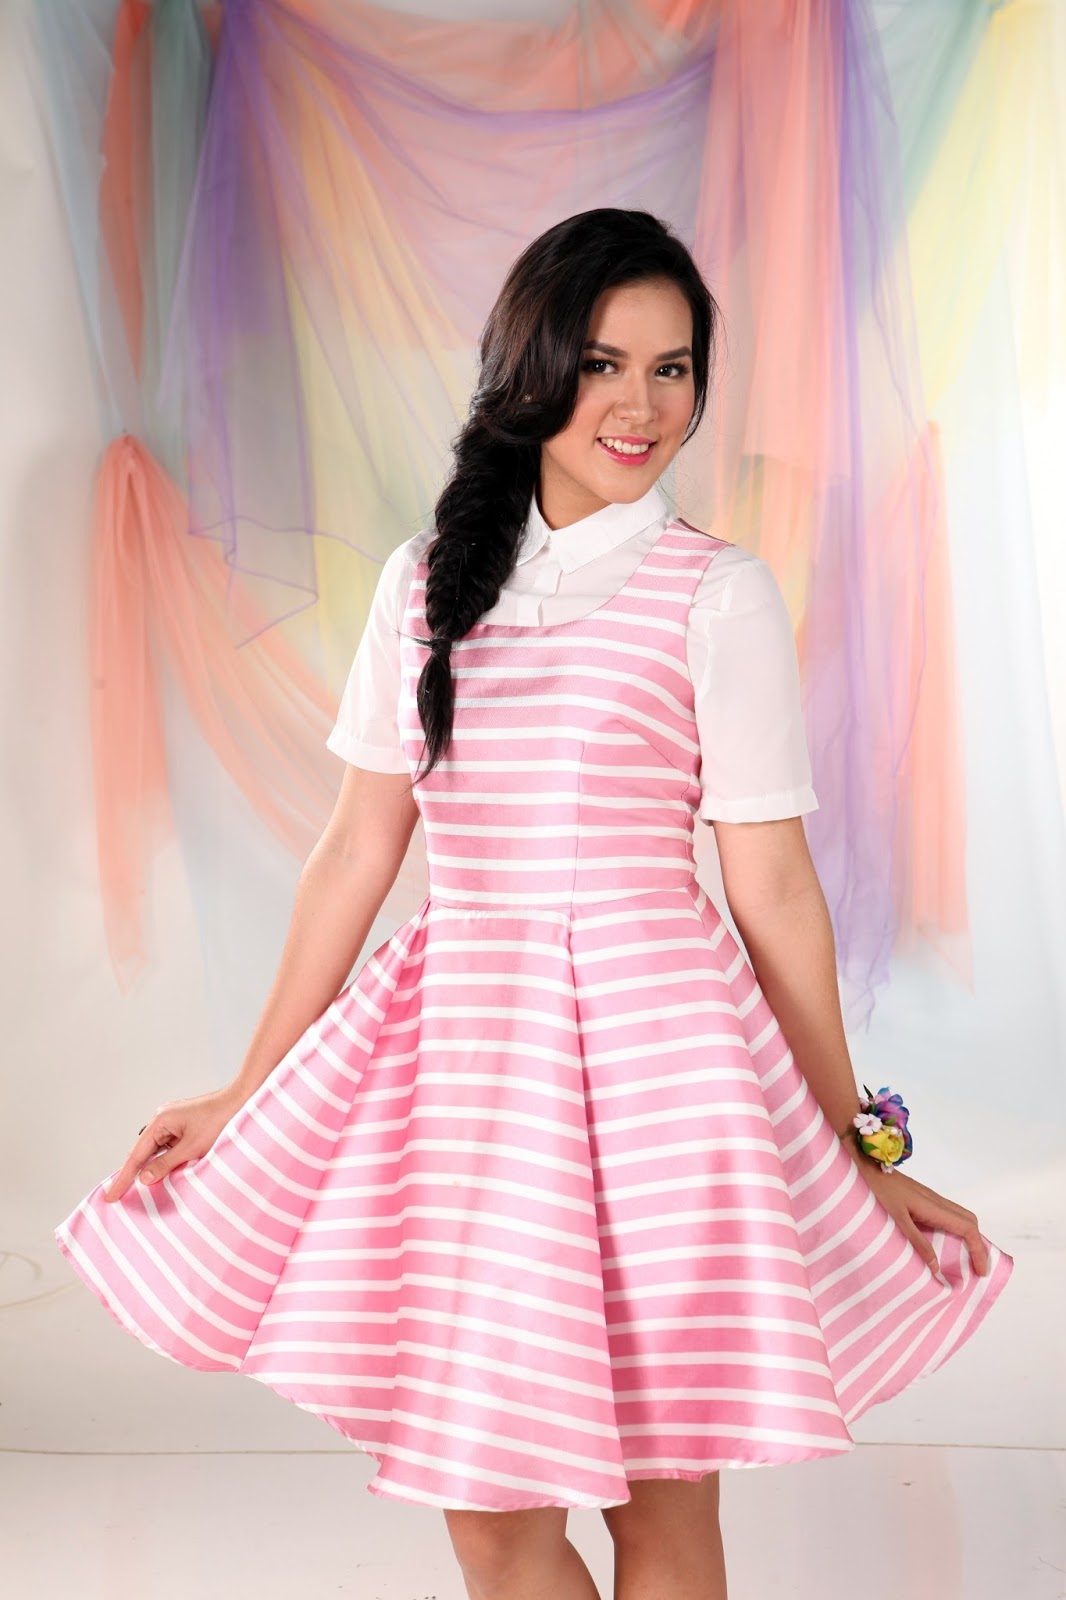 Penyanyi cantik bernama lengkap Raisa Andriana yang lebih dikenal dengan nama Raisa. Raisa adalah wanita cantik kelahiran 6 Juni 1990 ini terkenal setelah membawakan single berjudul Serba Salah. sebelum menjadi penyanyi solo, Raisa sempat terdaftar sebagai vokalis di band bentukan Kevin Aprilio yang saat ini dikenal dengan nama Vierra. Pada tahun 2011, Raisa mengeluarkan sebuah album berjudul Eponim yang dipruduksi oleh Solid Record dan Universal Music Indonesia. pakai baju Pink